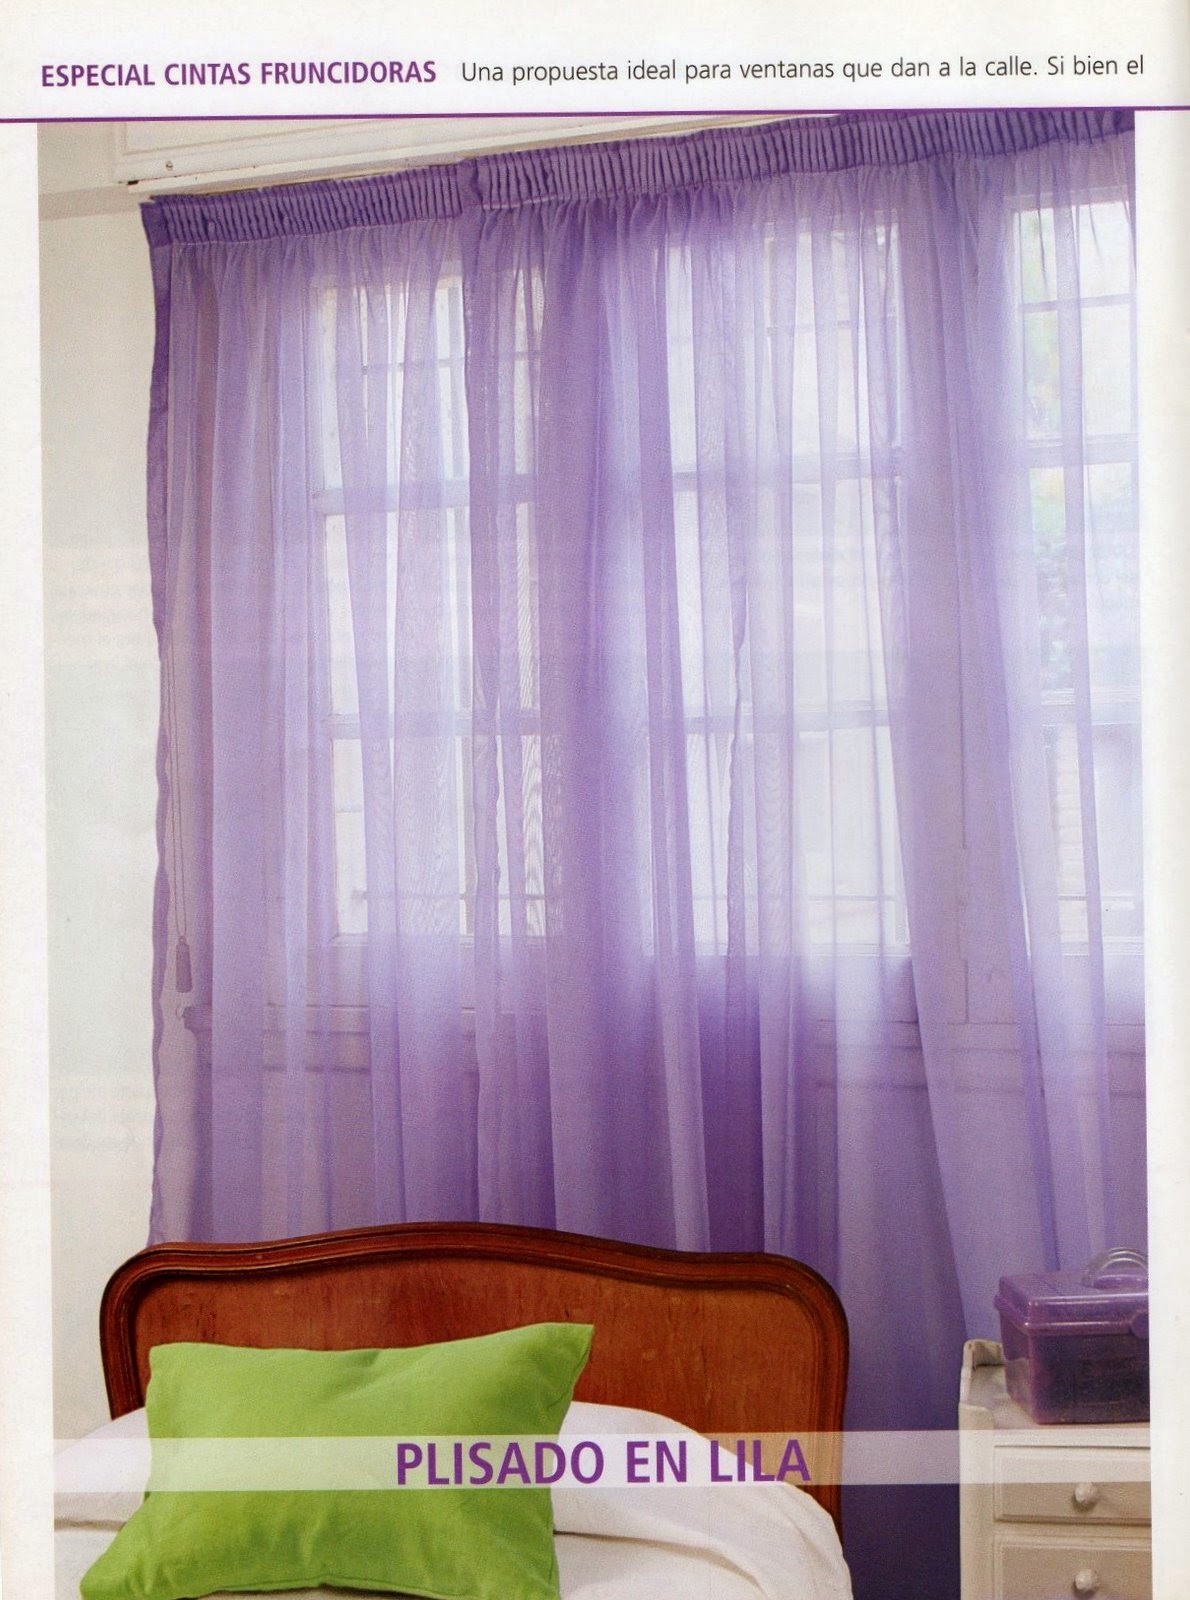 Como hacer cortinas paso a paso revistas de manualidades - Cortinas de goma ...